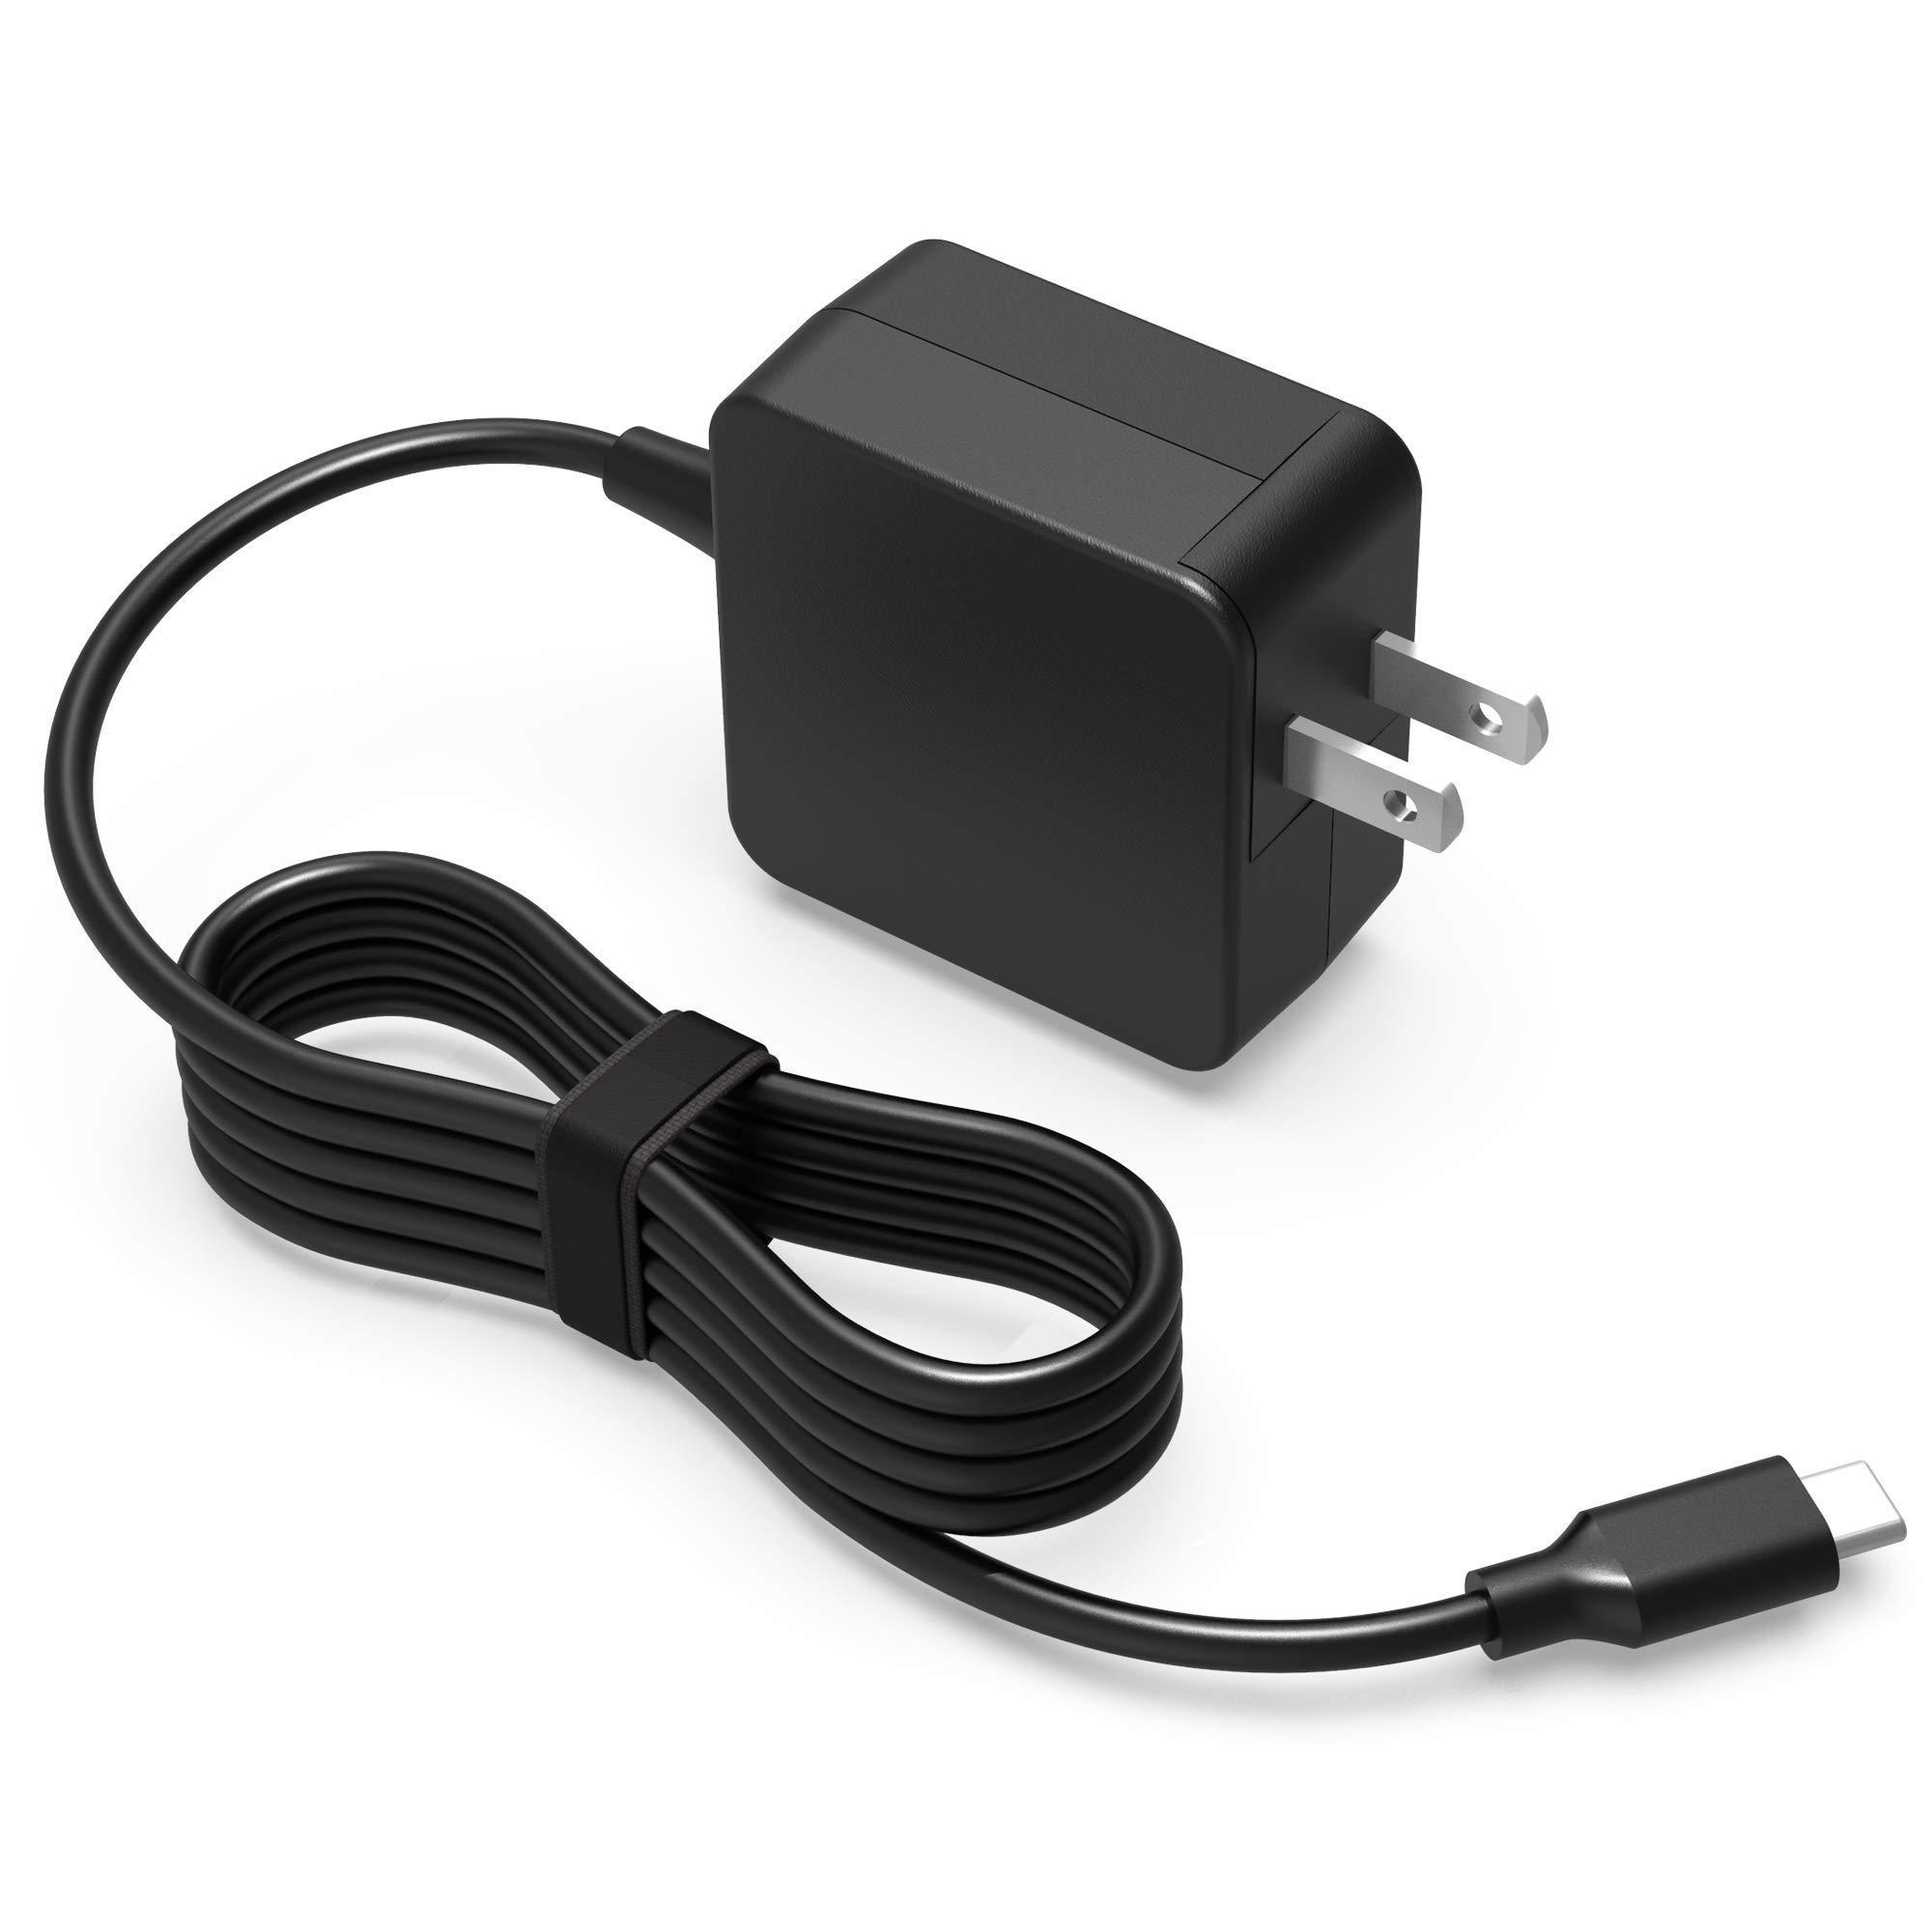 45W USB-C AC Charger for Lenovo Chromebook N23 Yoga, ThinkPad X1 Yoga 2nd 3rd Gen, X1 Carbon 5th 6th Generation 4x20e75131 4X20M26252 4GX20N20876 Type-C Laptop USB Type C Power Supply Adapter Cord